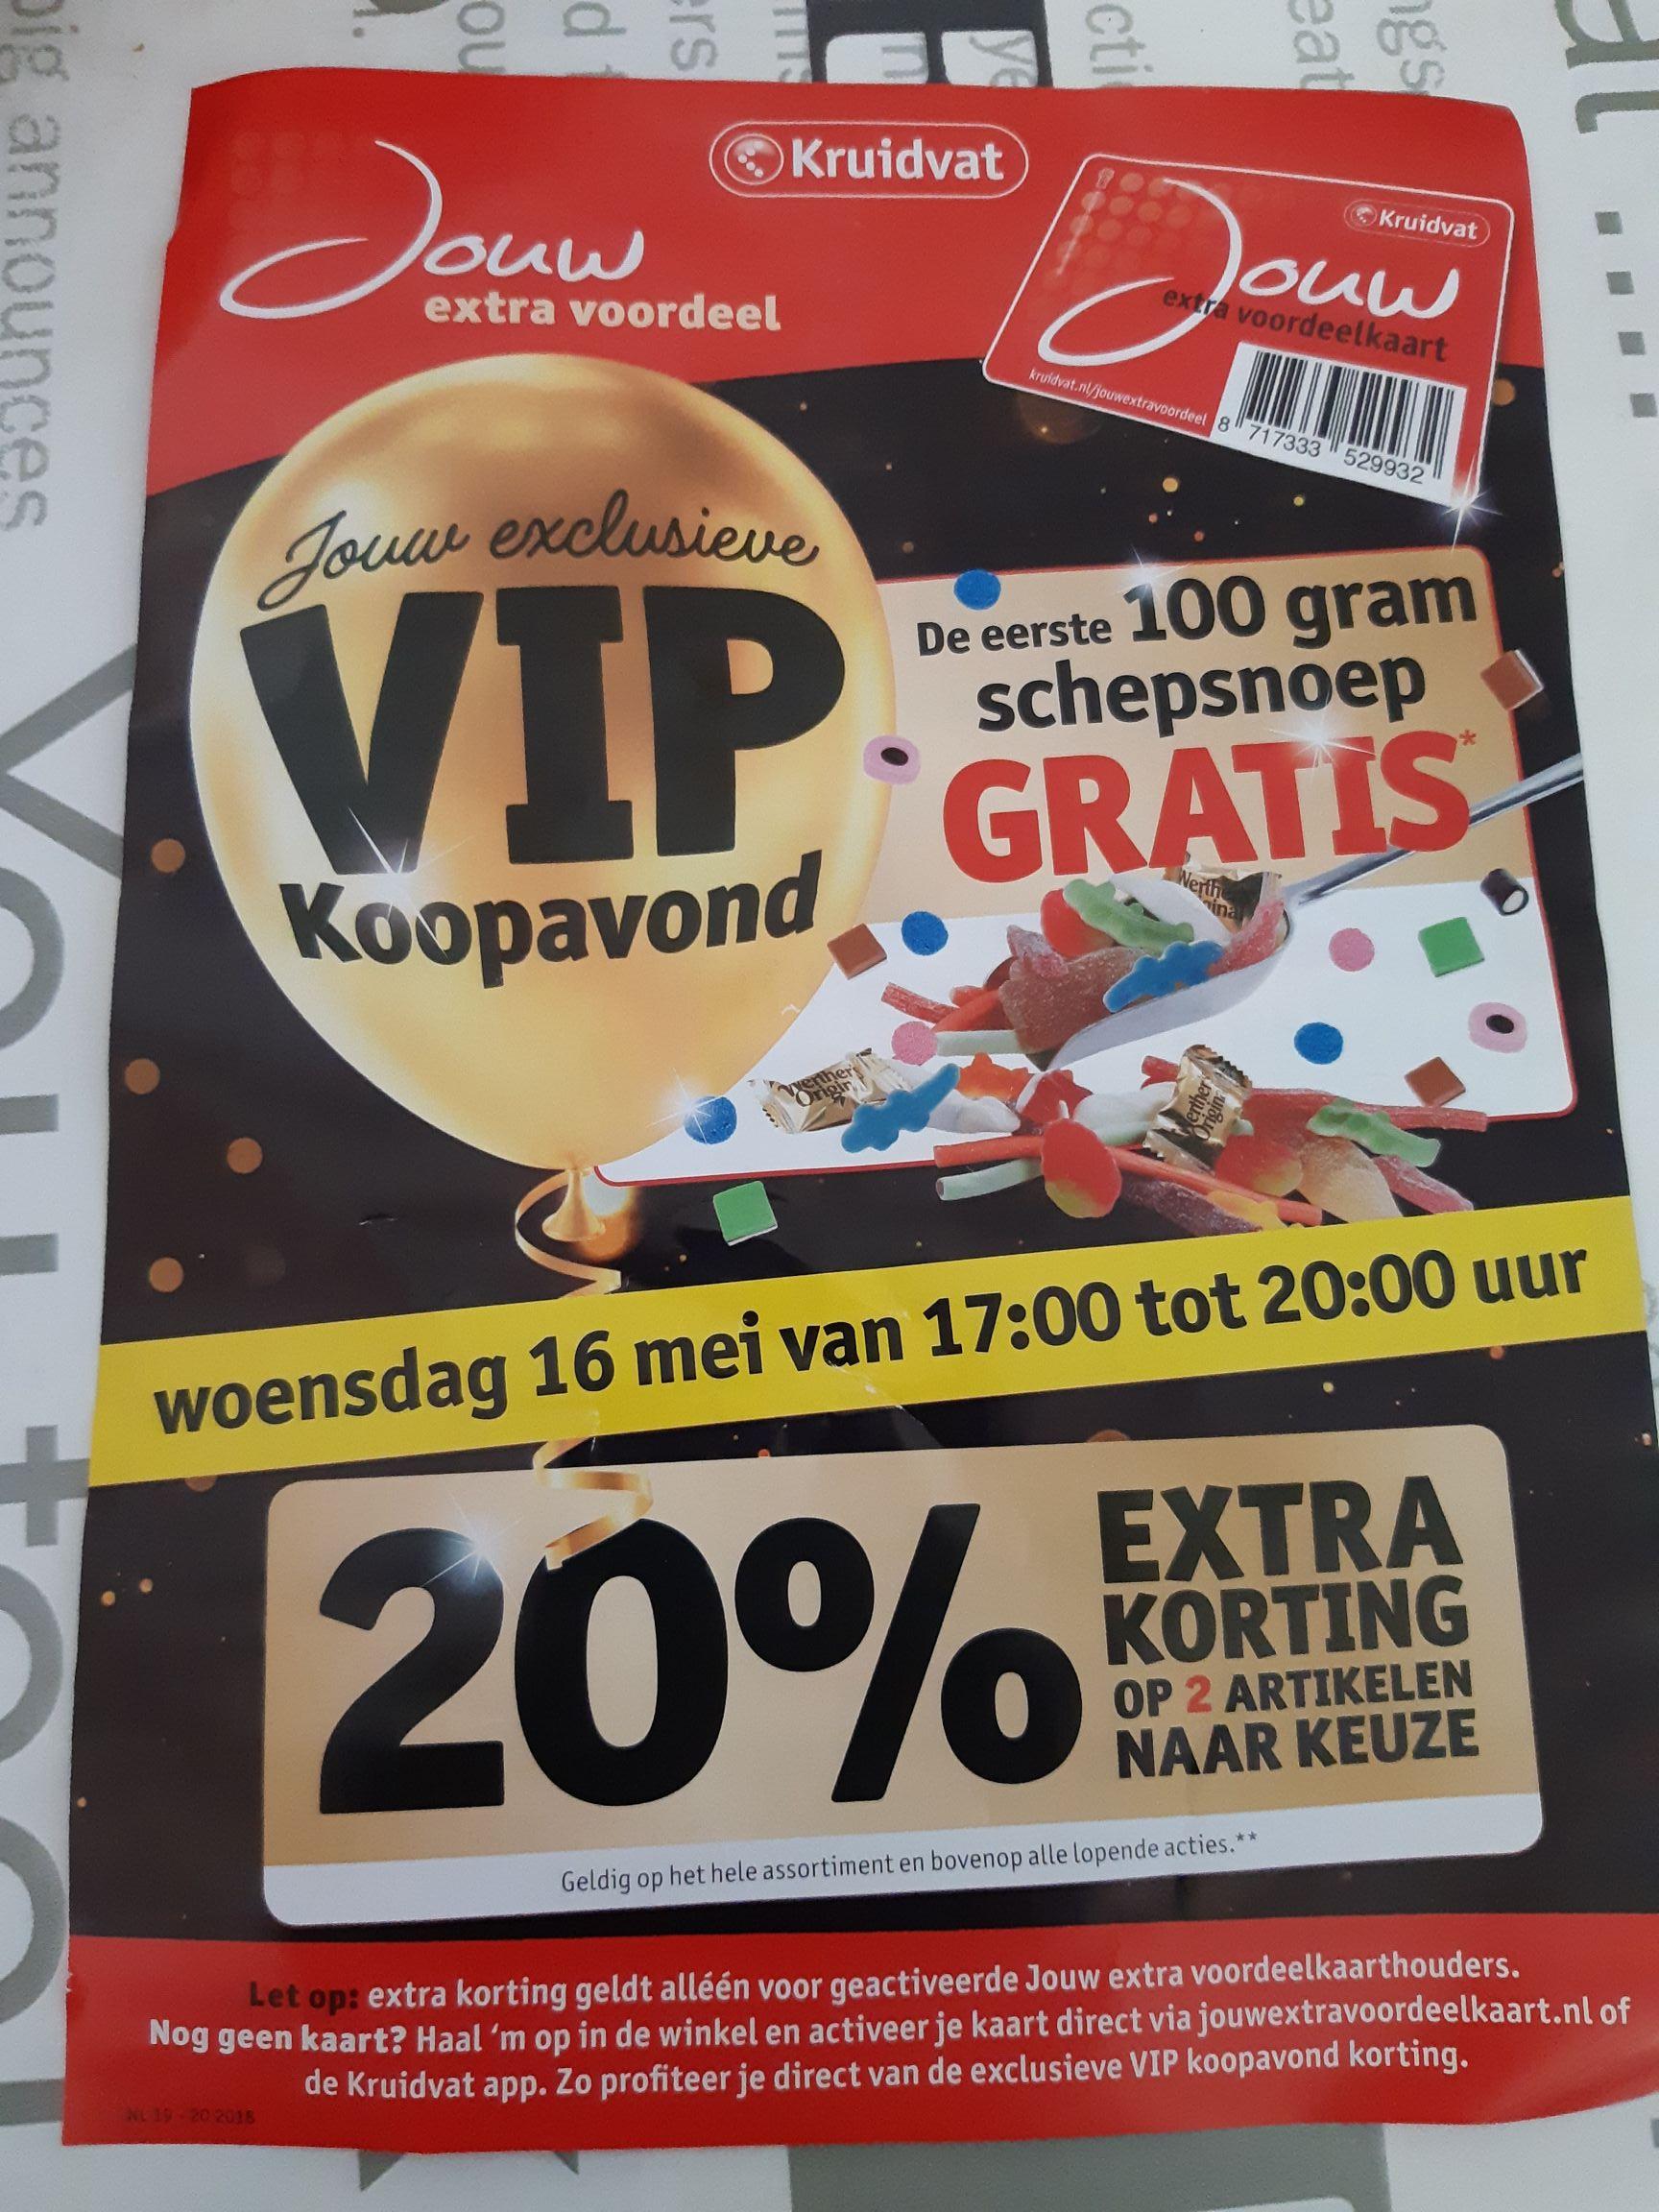 Vandaag vanaf 17.00: 2x20% korting op product naar keuze @ Kruidvat